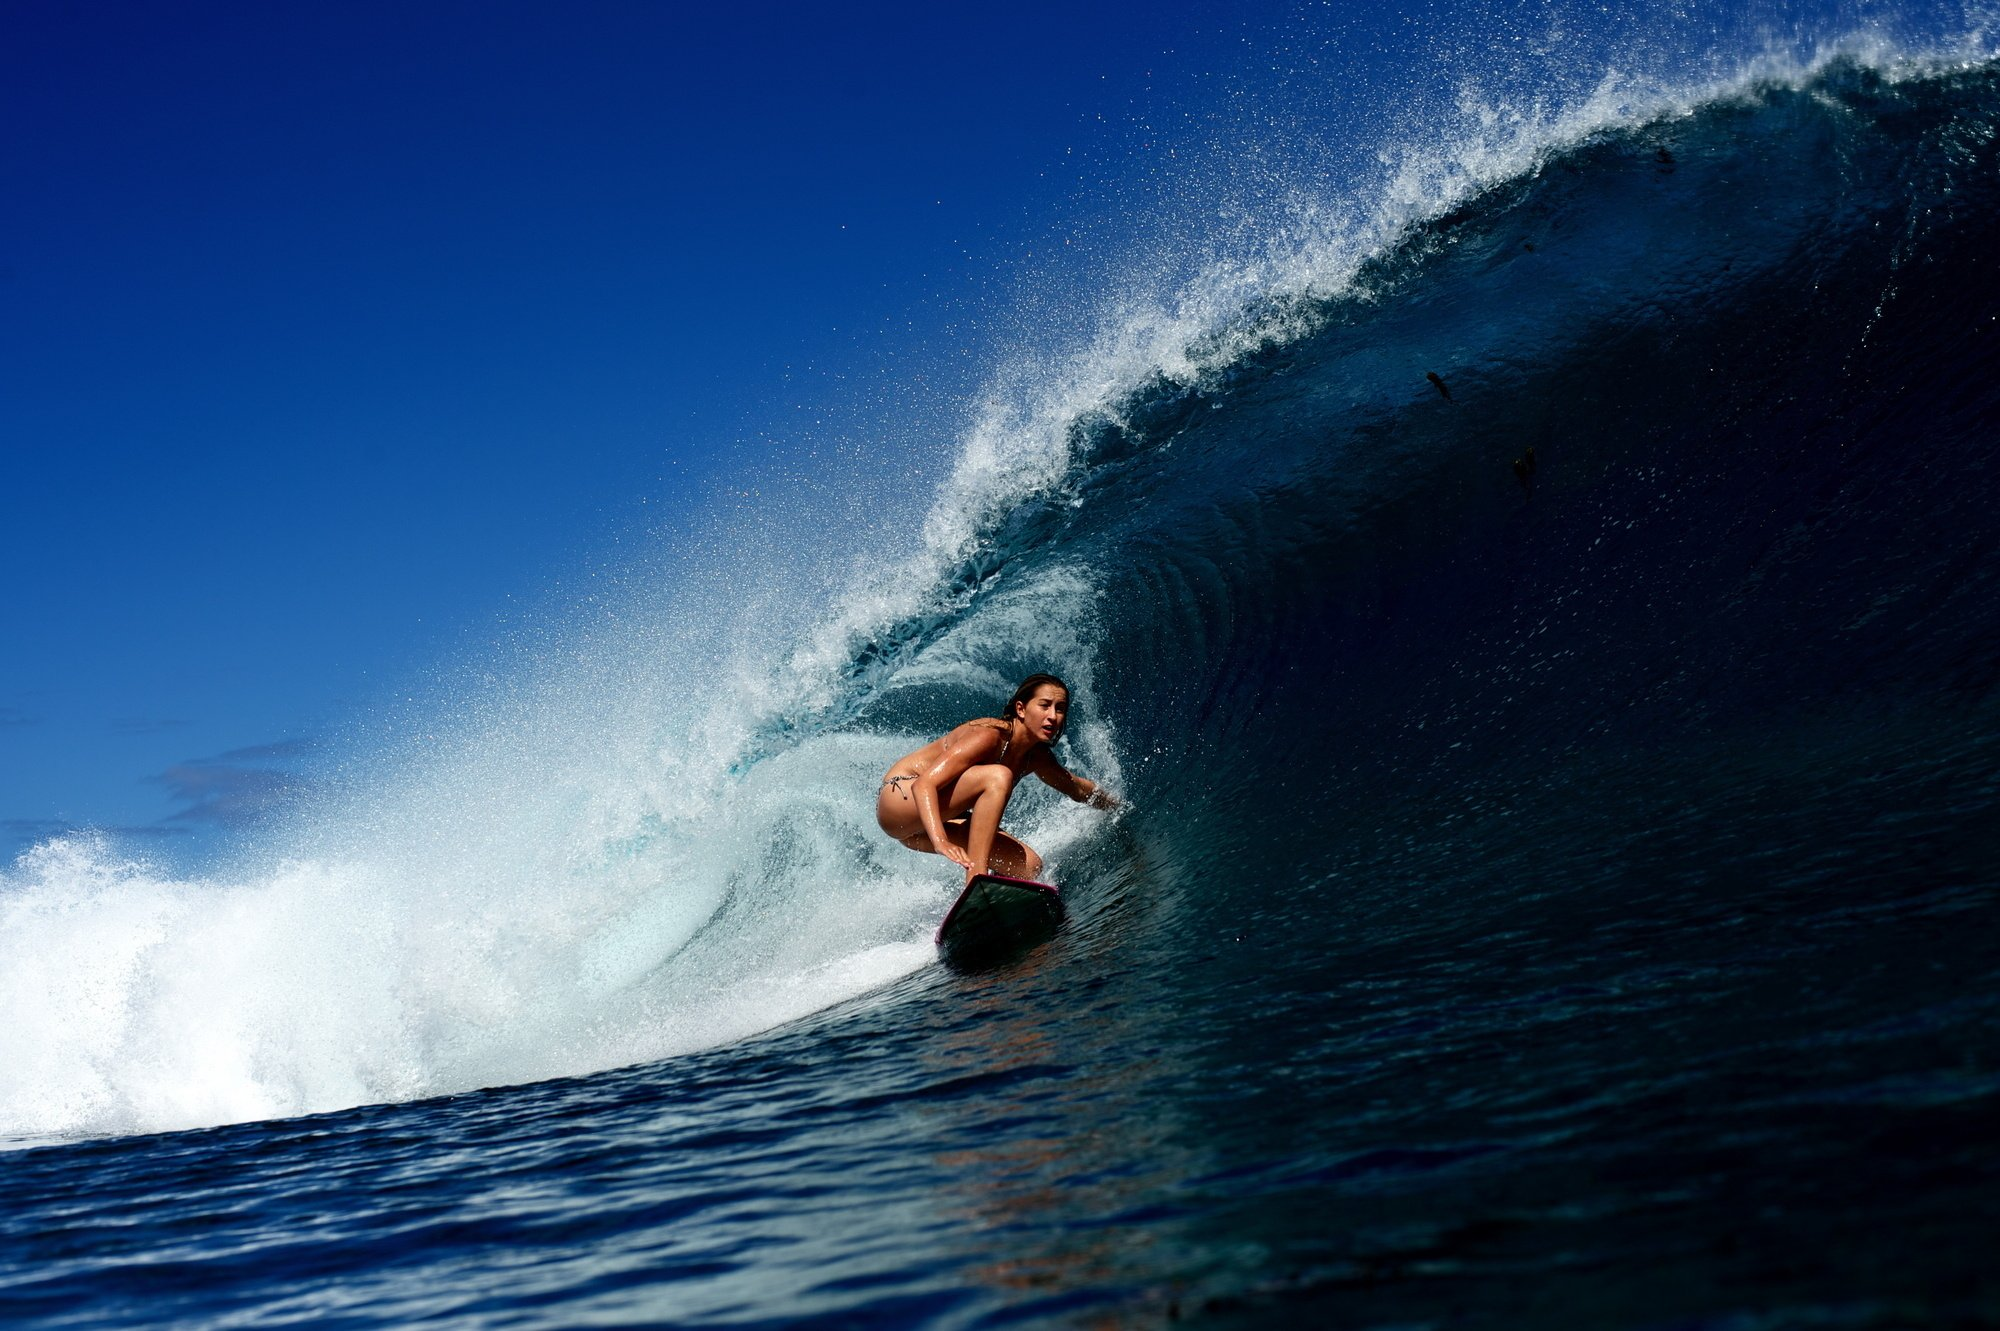 Wave surfing girl surfing ocean bikini sexy babe wallpaper 2000x1331 2000x1331